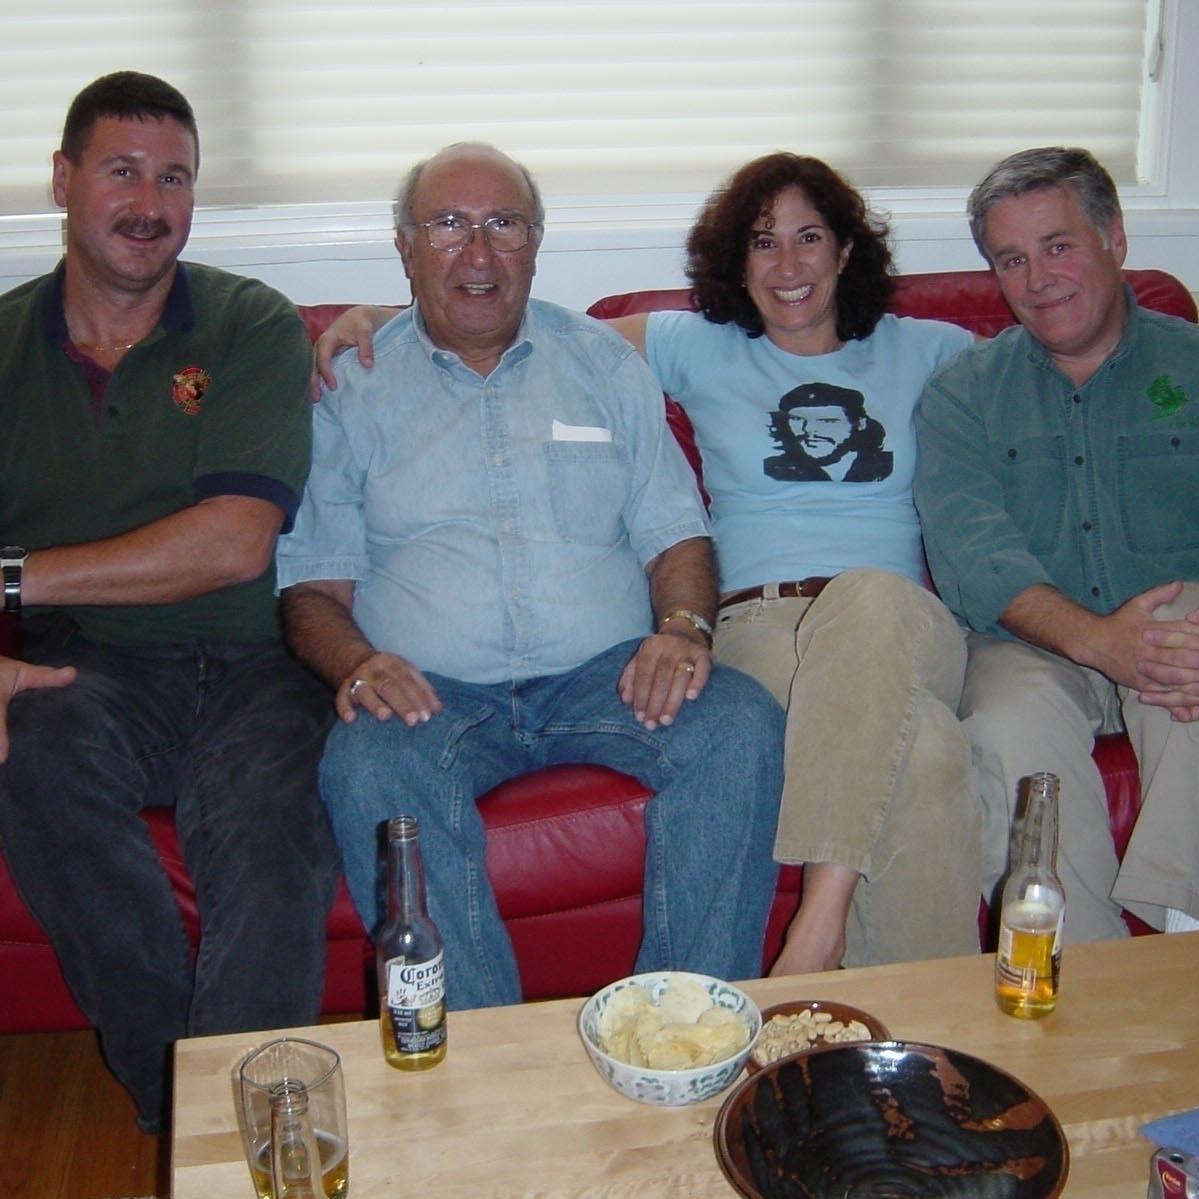 Author Carol Shaben marks the crash's 20-year anniversary with three of its survivors (from left): Erik Vogel, Larry Shaben and Scott Deschamps.